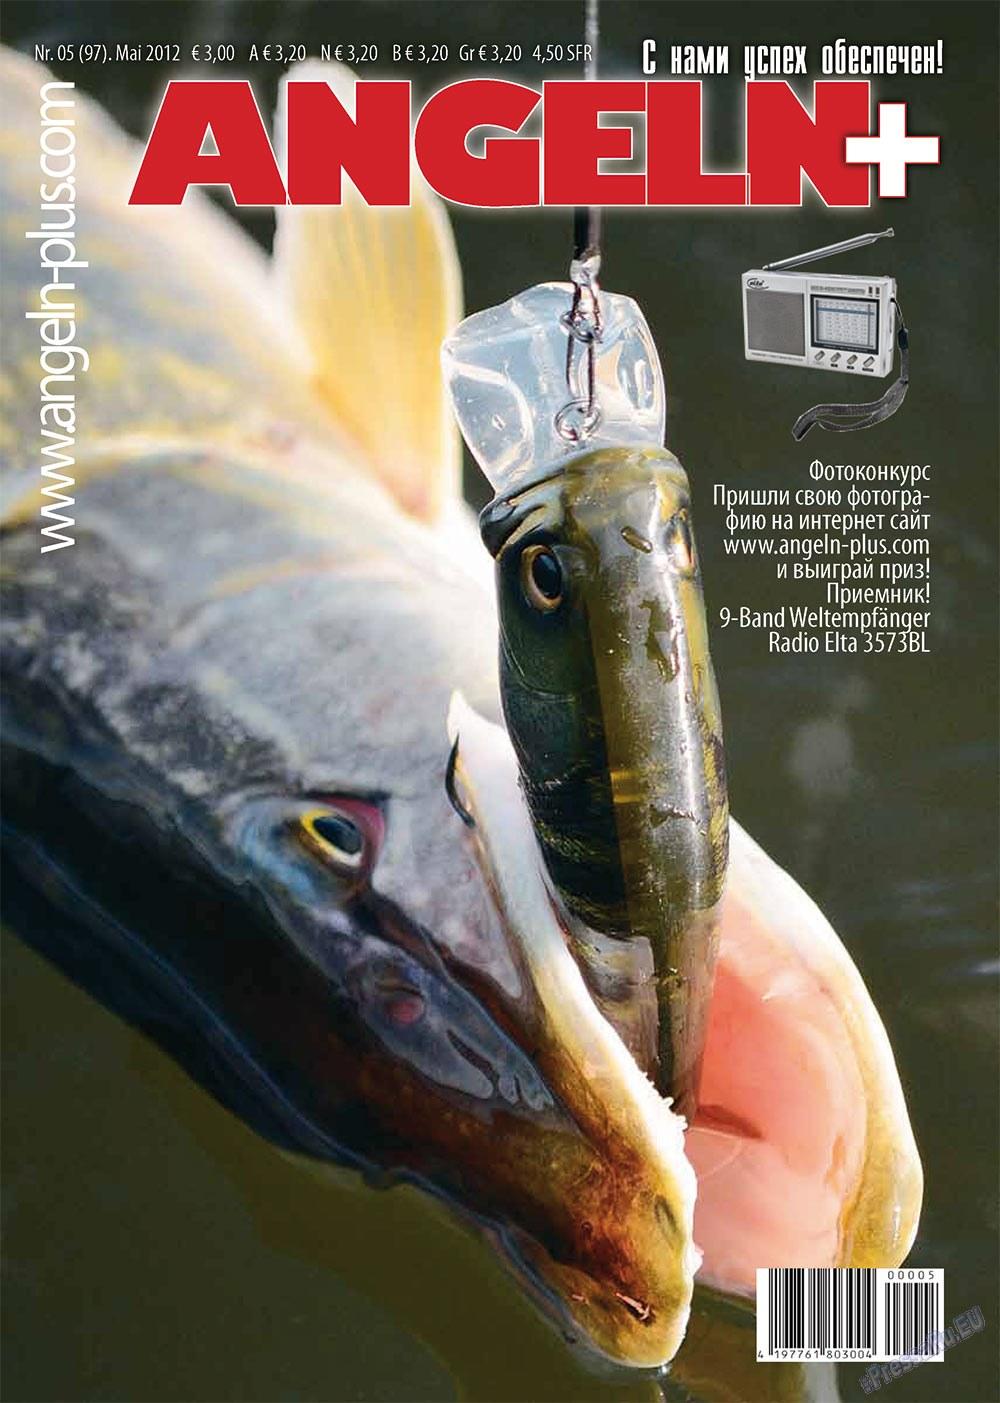 Рыбалка Plus (журнал). 2012 год, номер 5, стр. 1